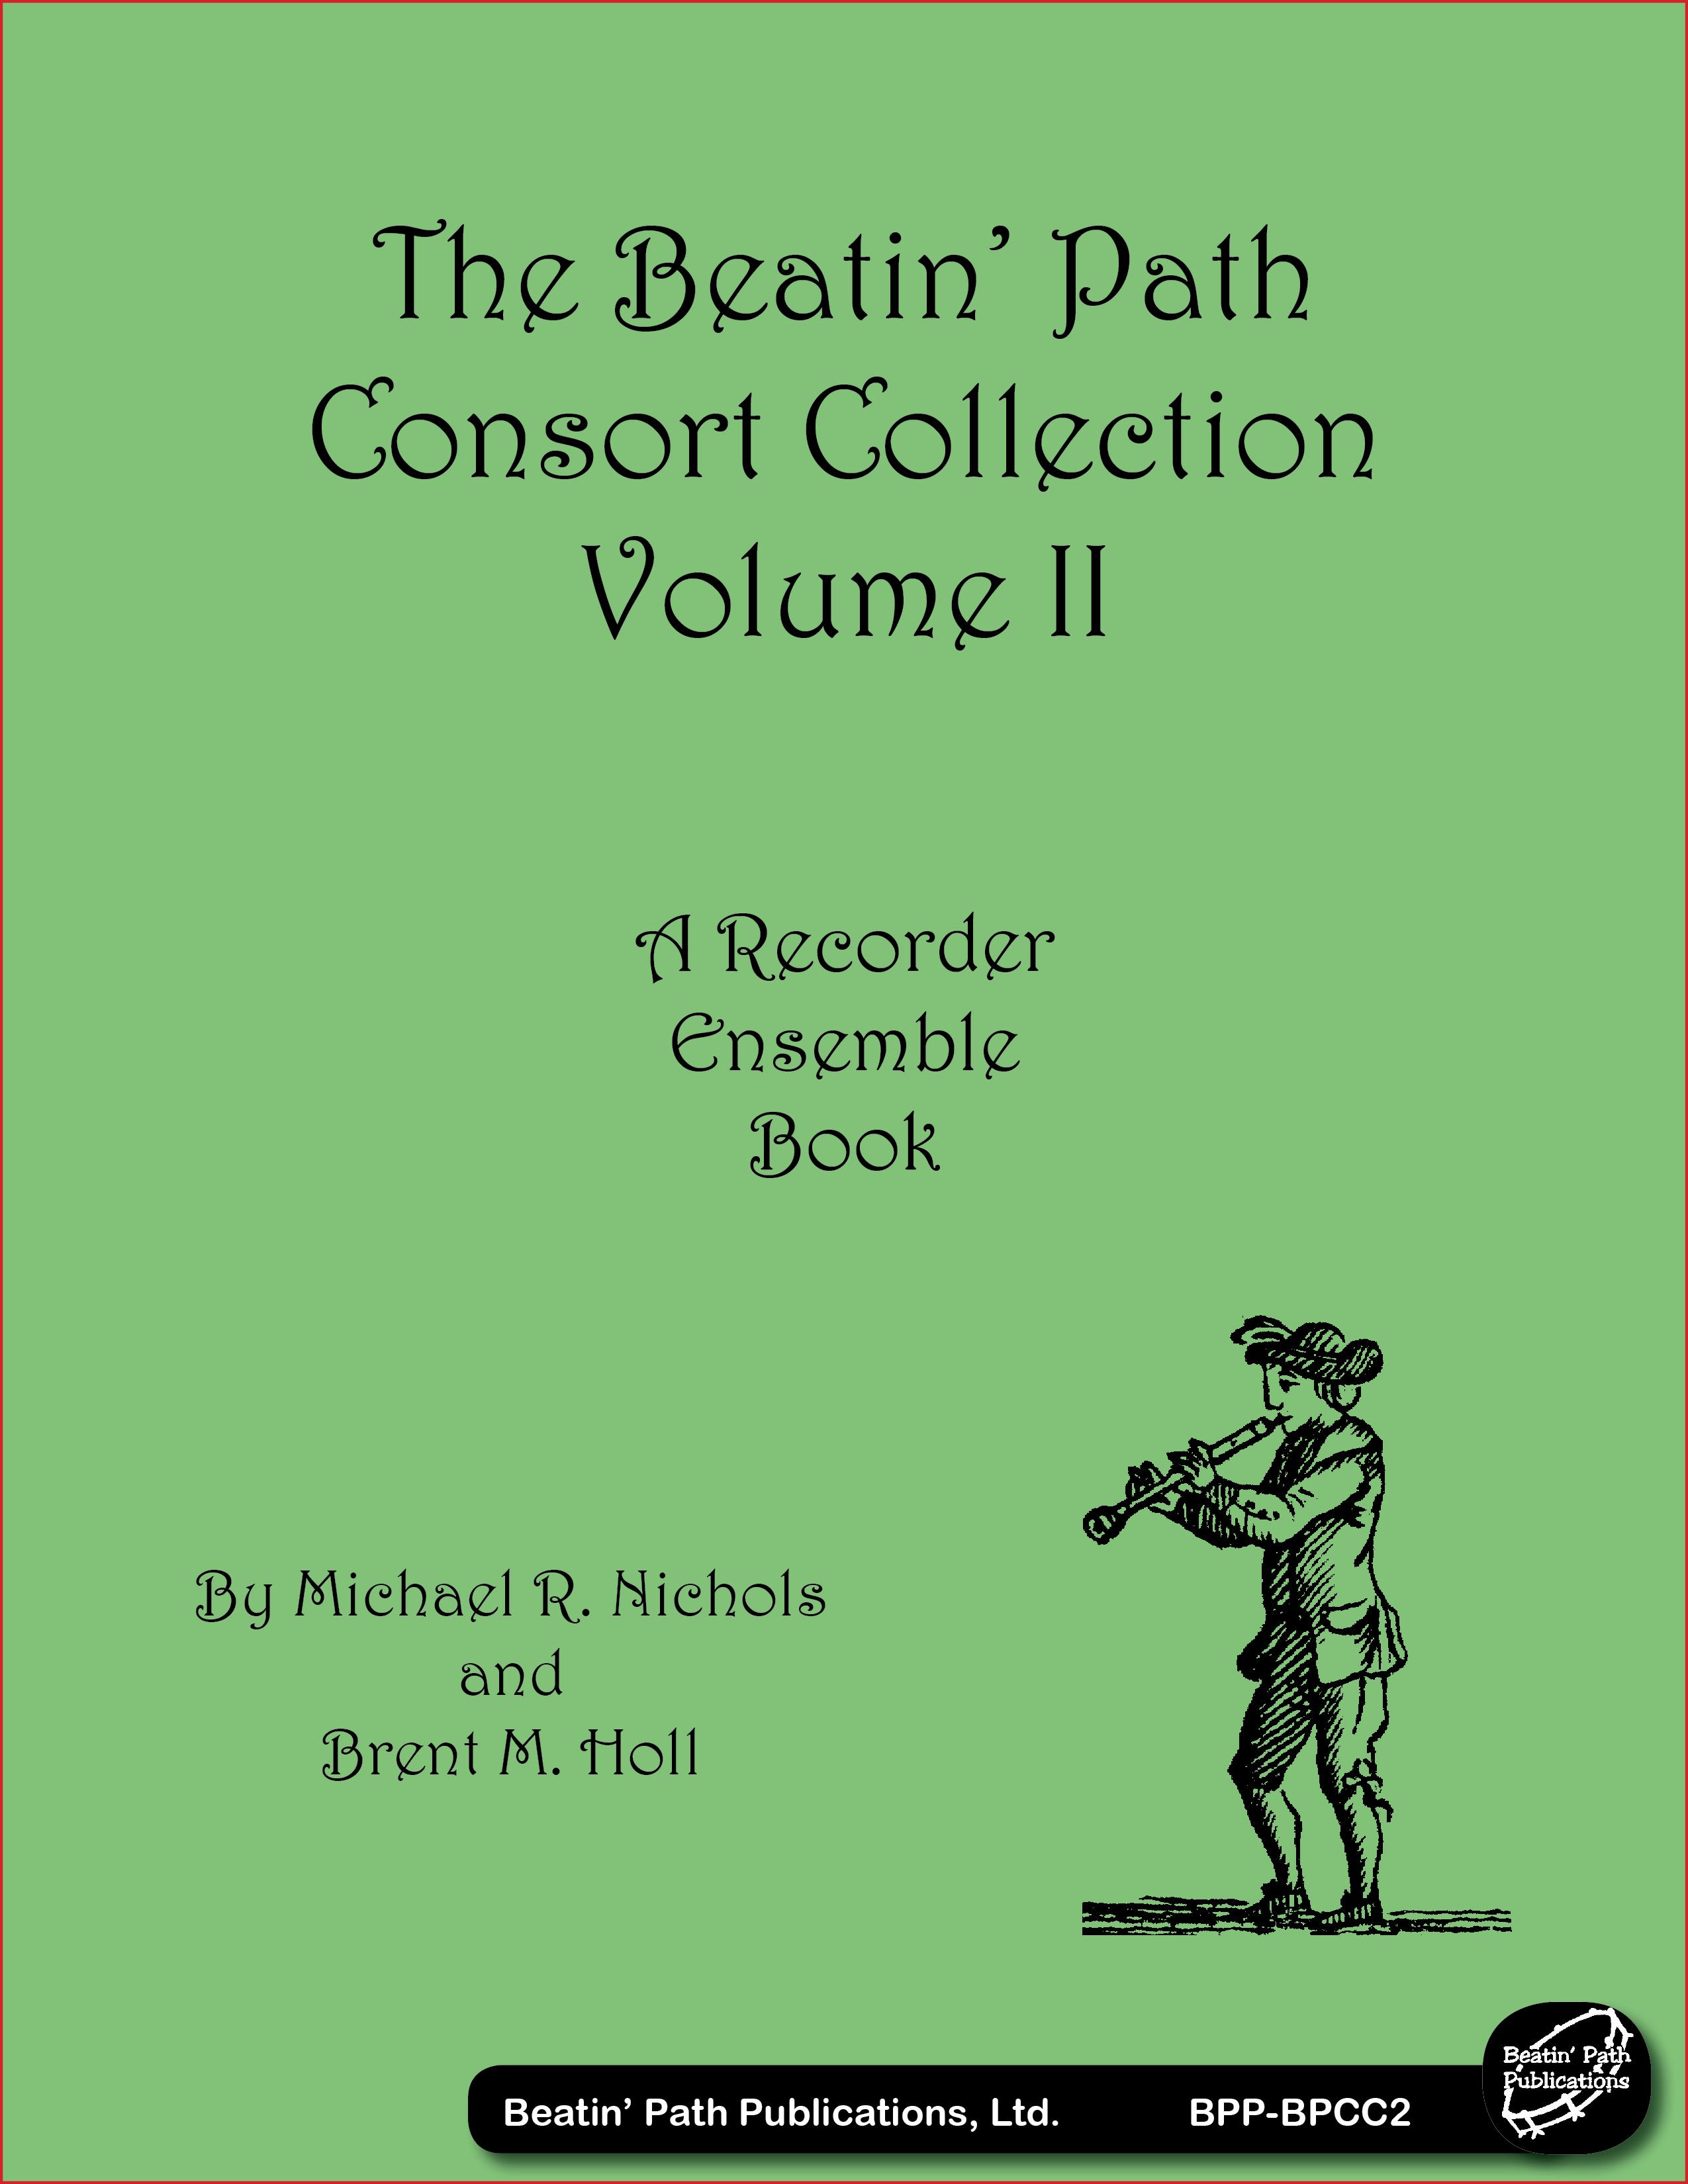 Beatin' Path Publications, LLC